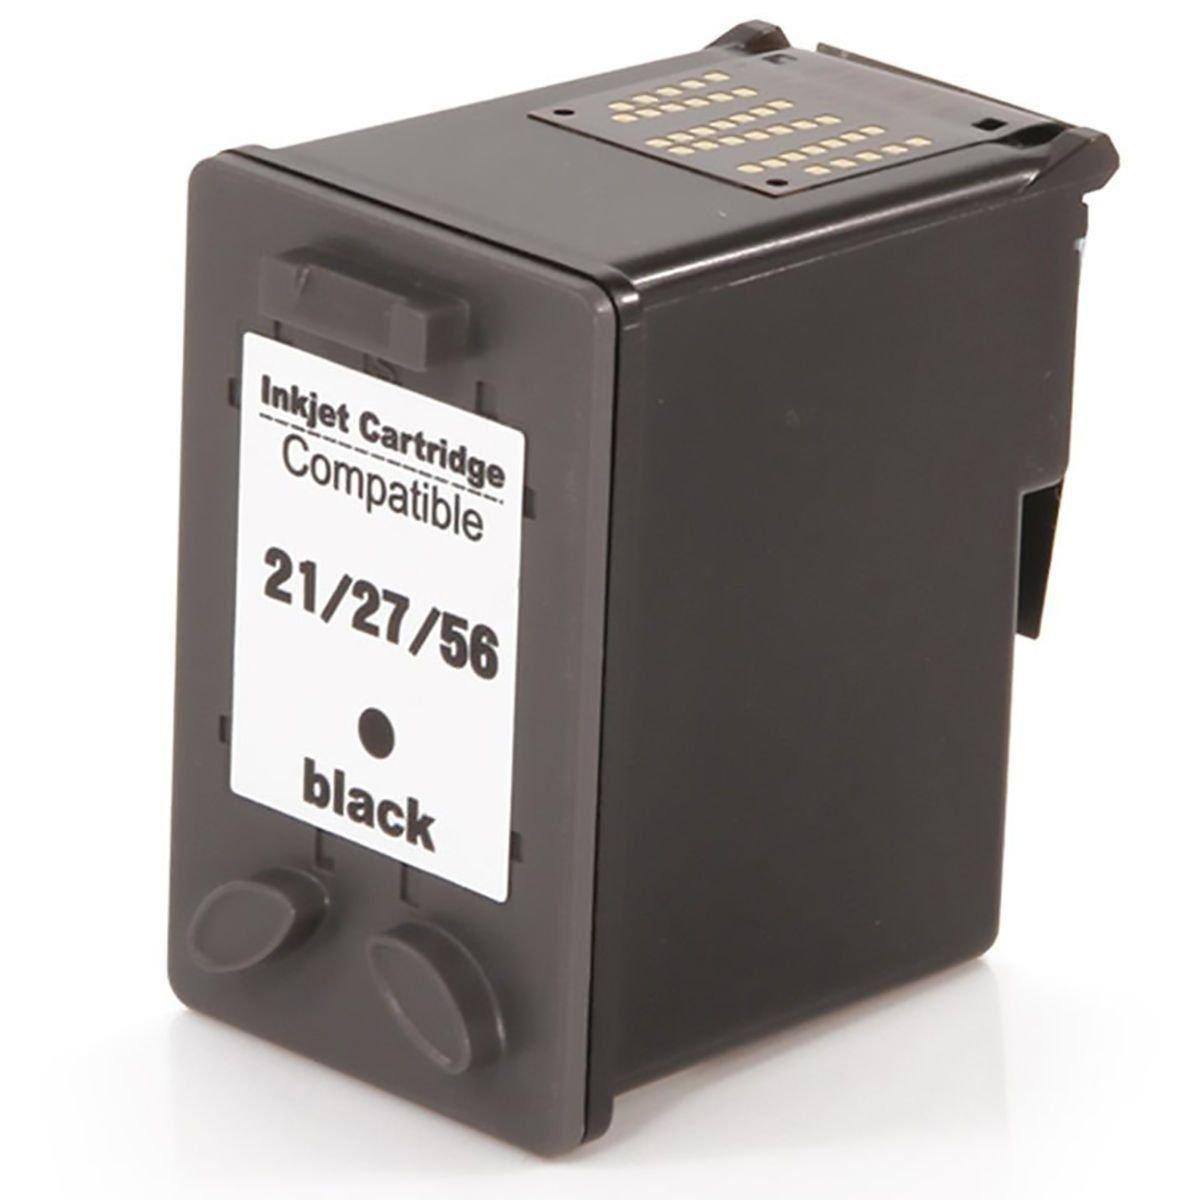 Cartucho de Tinta Compatível HP 21/27/56 (9351/8727/6656) Preto 10ml